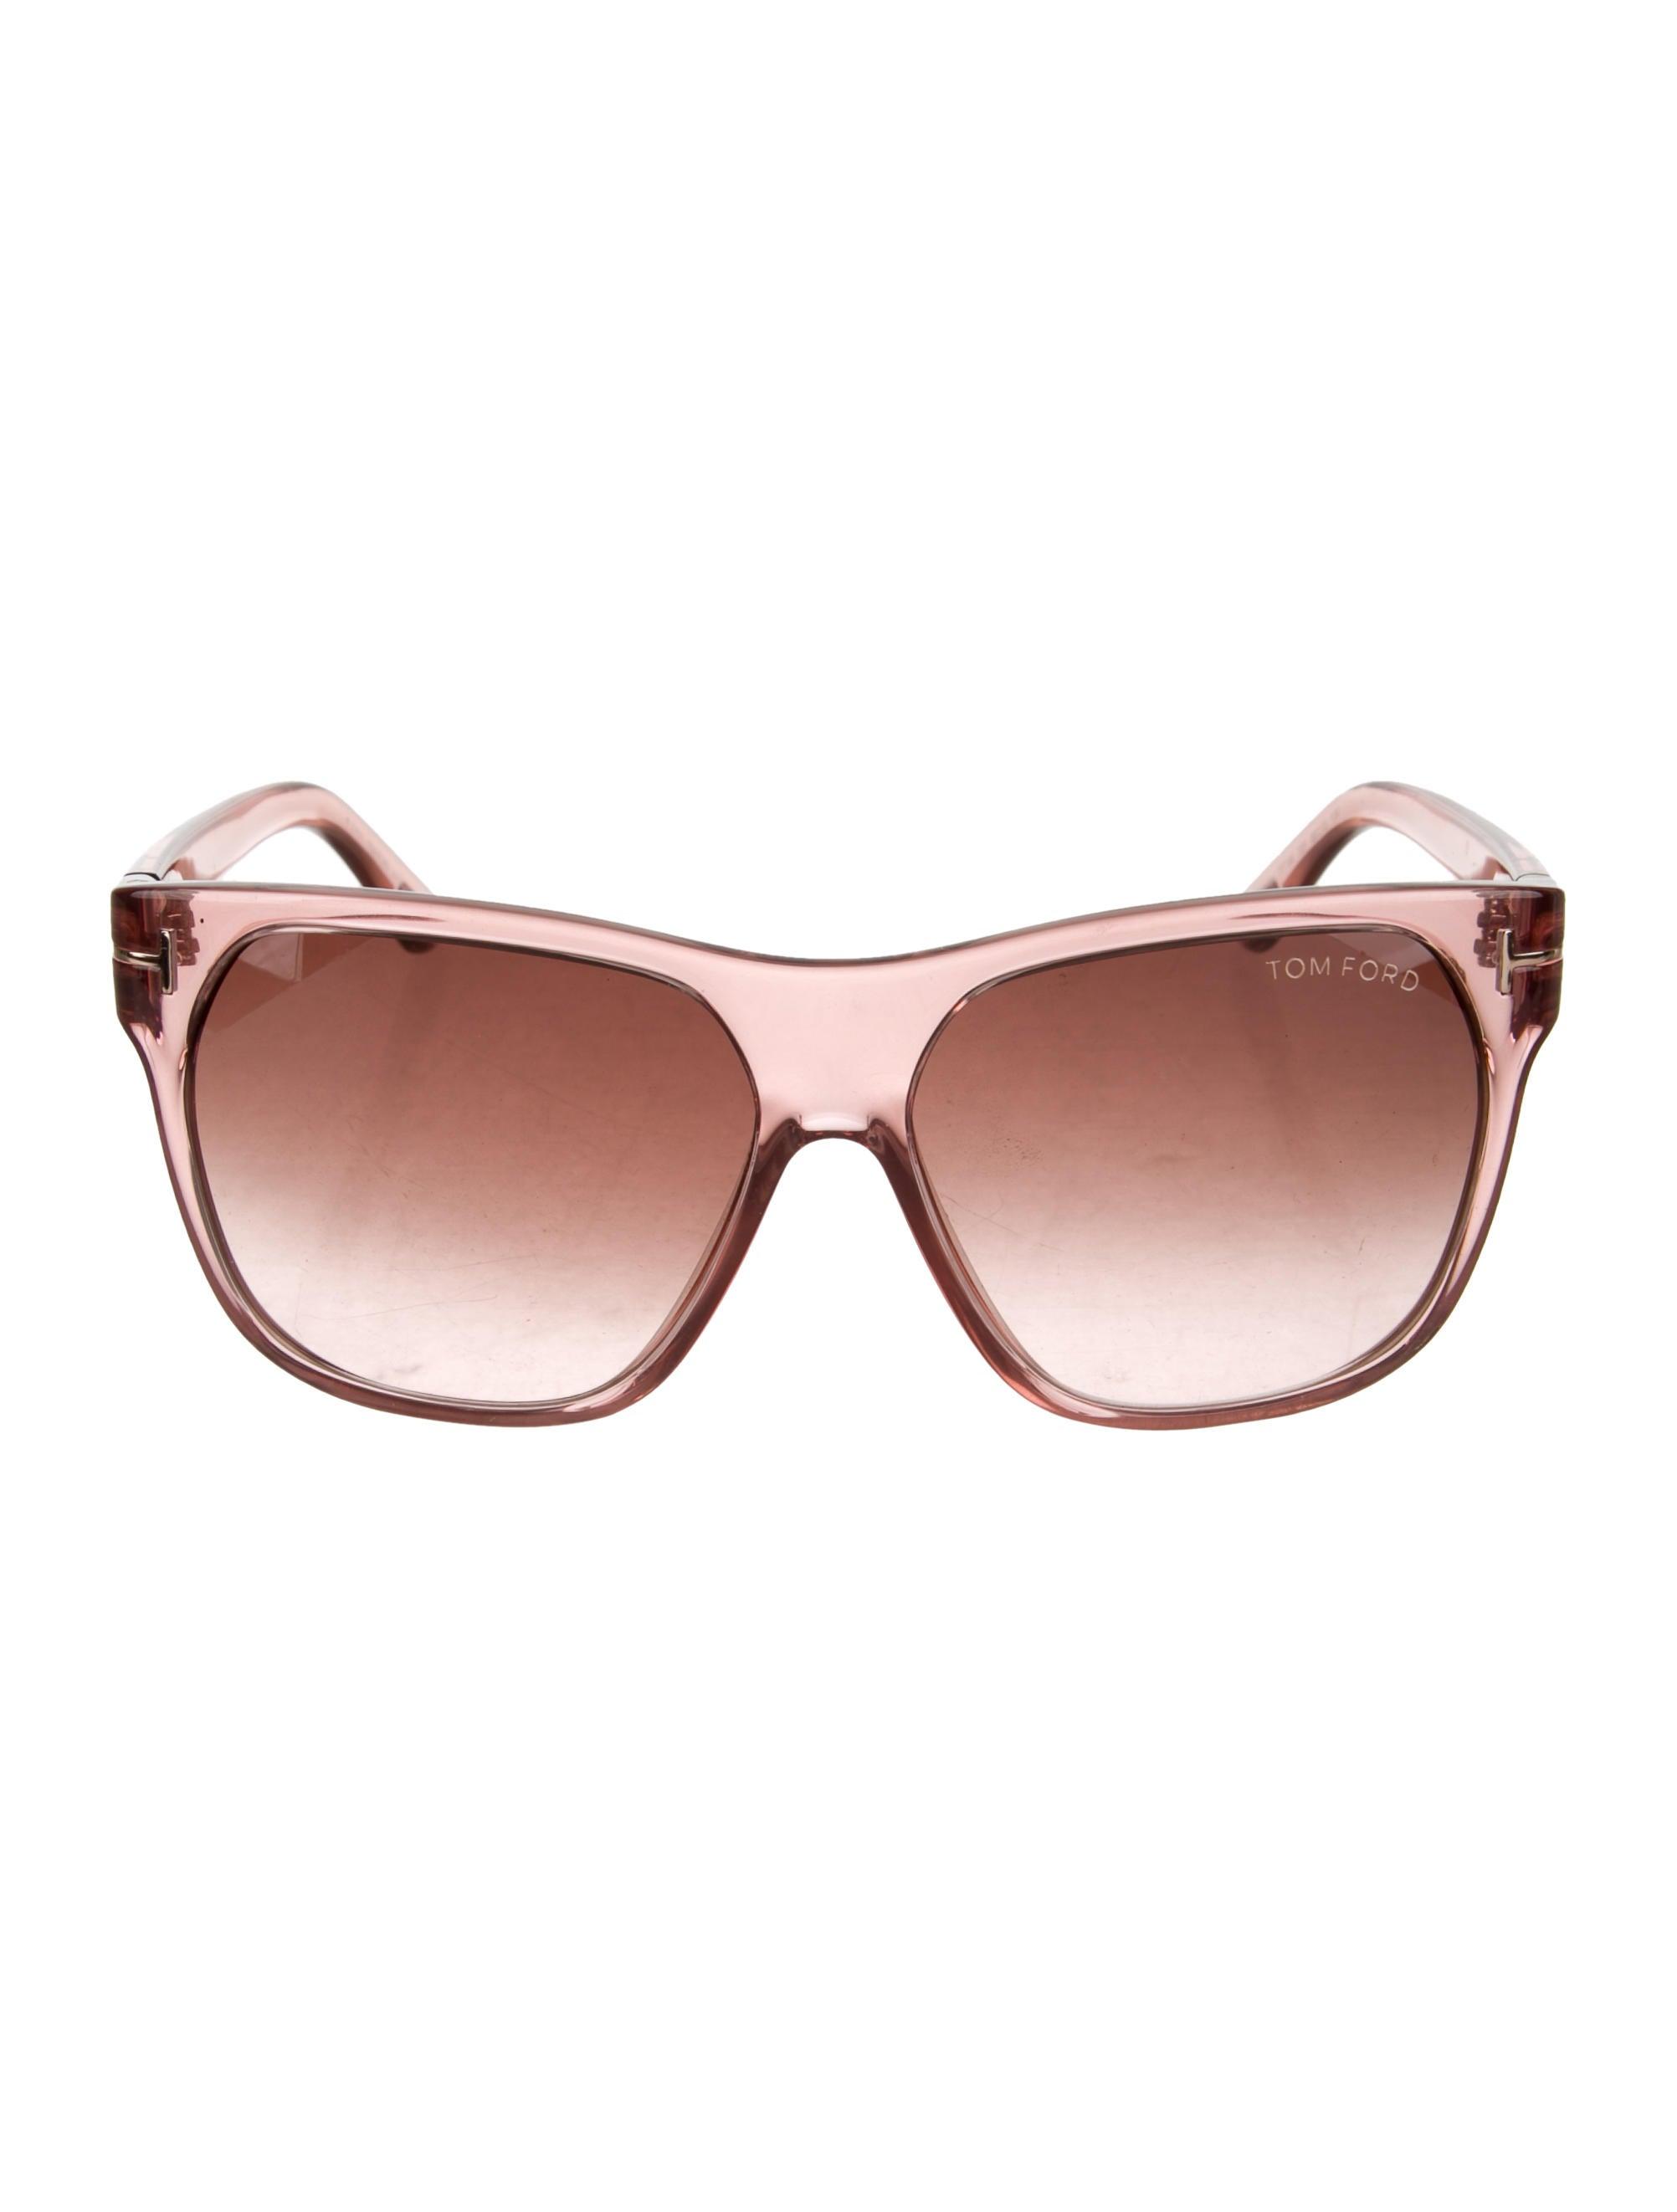 bdf24aeee4 Tom Ford Federico Logo Sunglasses - Accessories - TOM47996